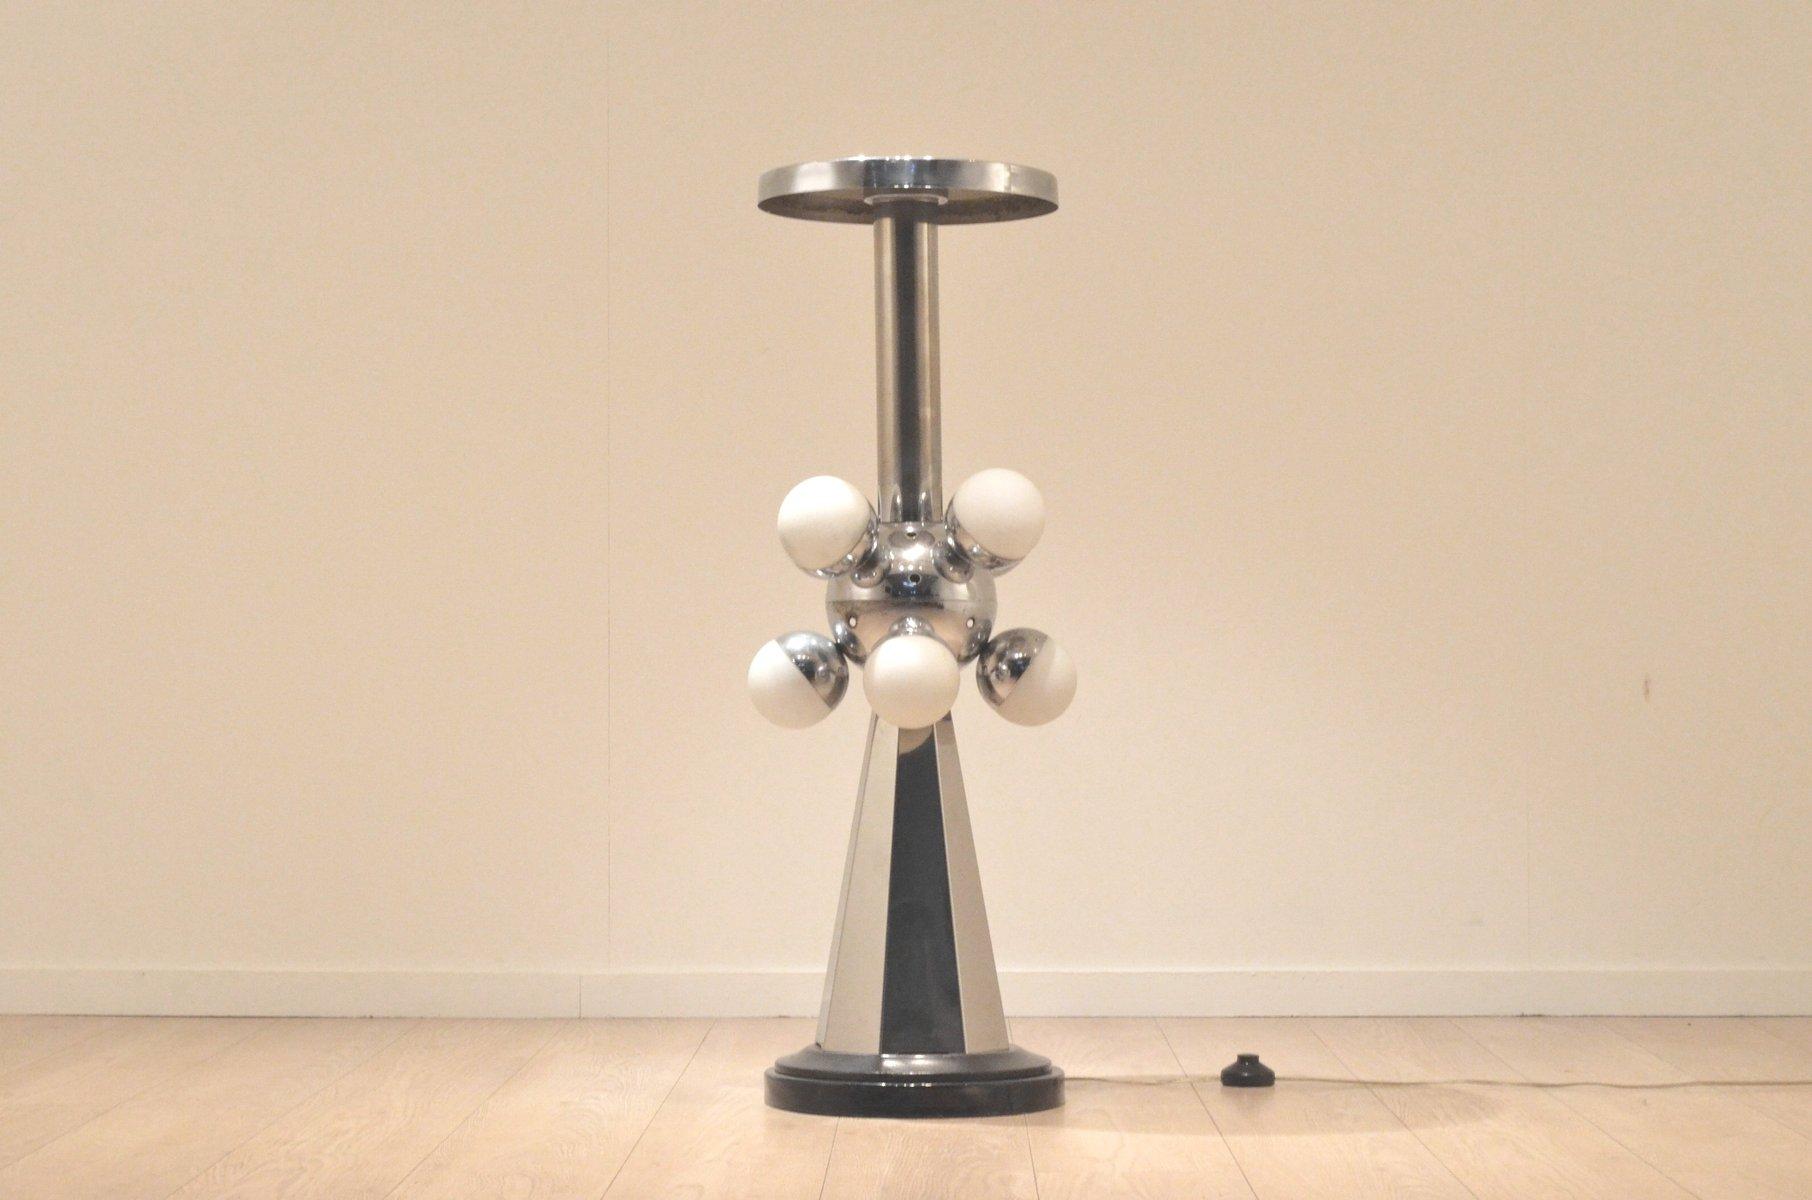 Mid-Century Sputnik Chrom Lampe mit Ablage, 1960er